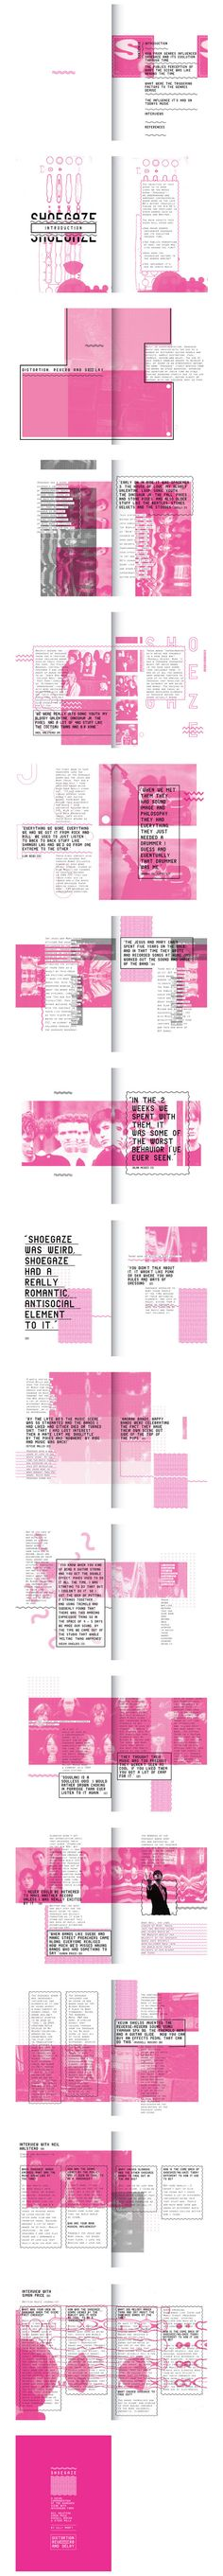 Distortion Reverb and Delay // Shoegaze Fanzine on Behance